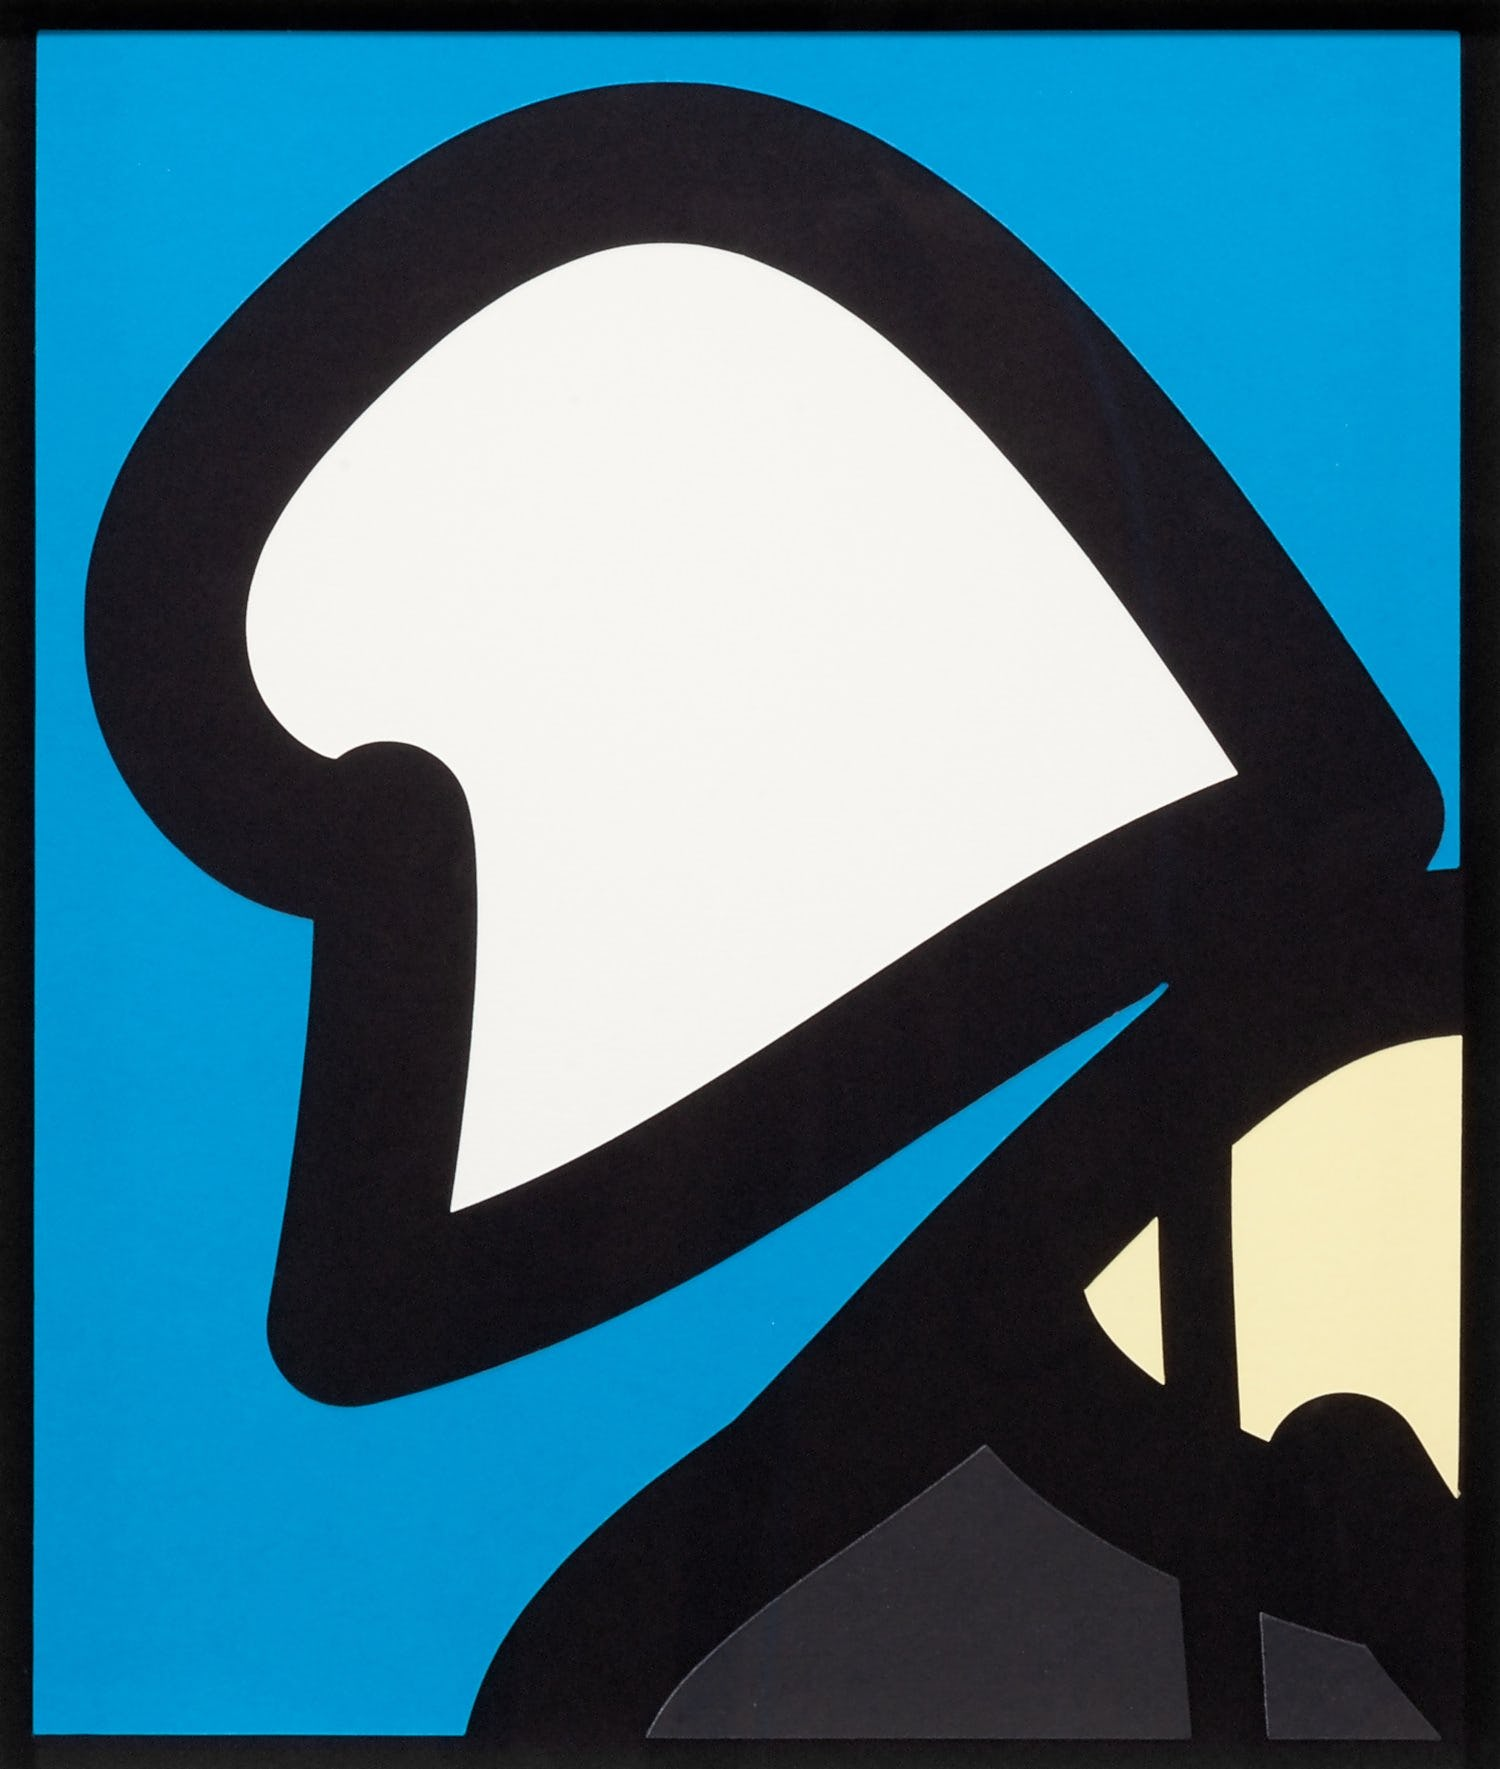 Beach head 8. Cut out poster by Julian Opie